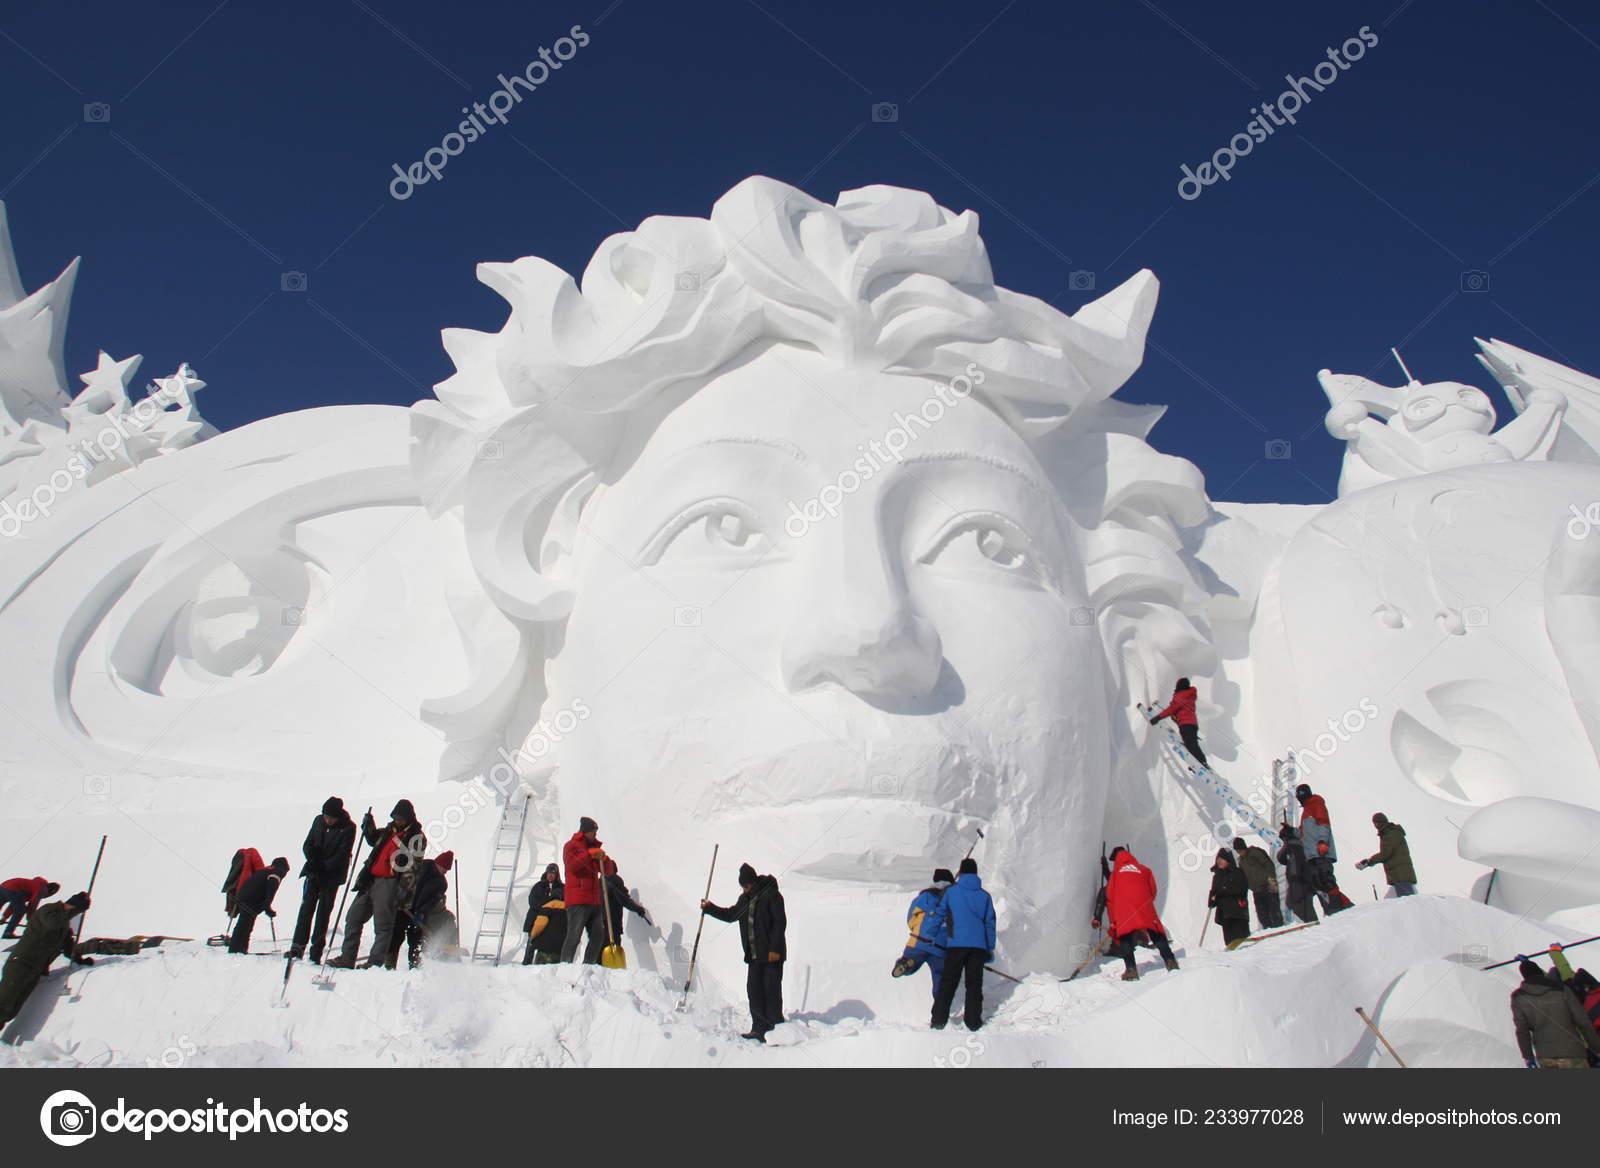 Artists Sculptors Work Main Snow Sculpture 31St Harbin Sun Island